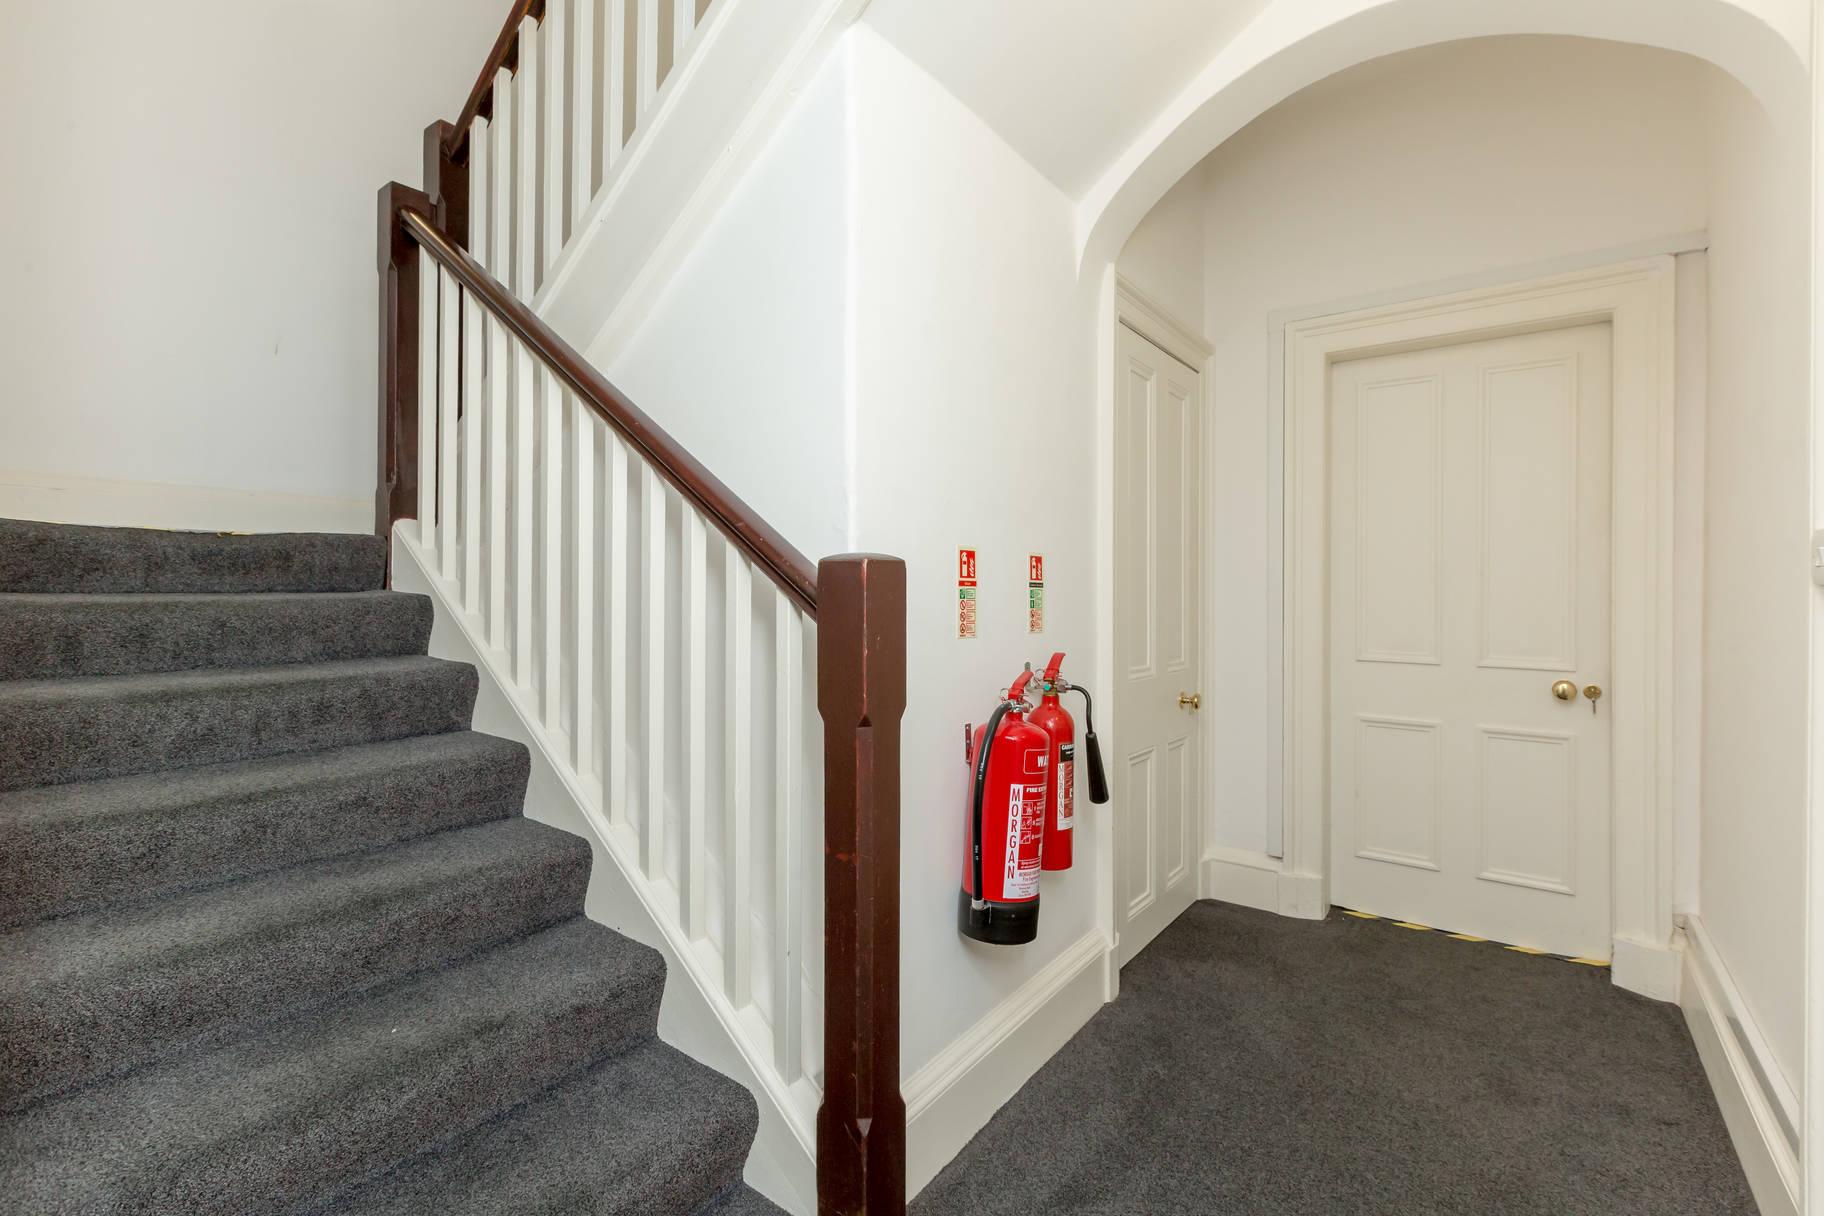 31 Palmerston Place, Edinburgh, EH12 5AP